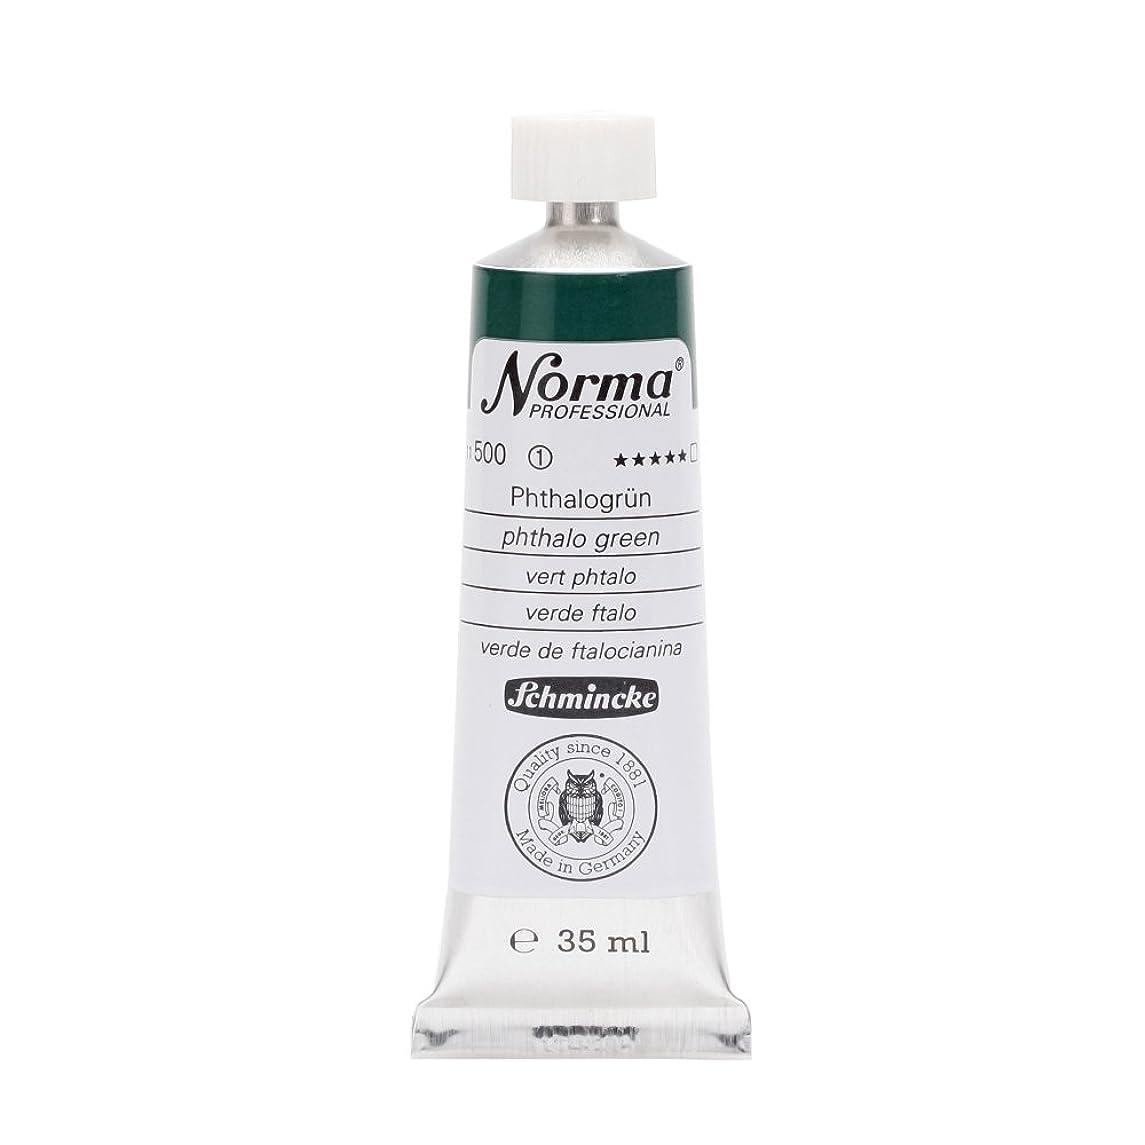 Schmincke Norma Professional 35 ml Paint, Phthalo Green (11500009) koyyxwkdosdgen